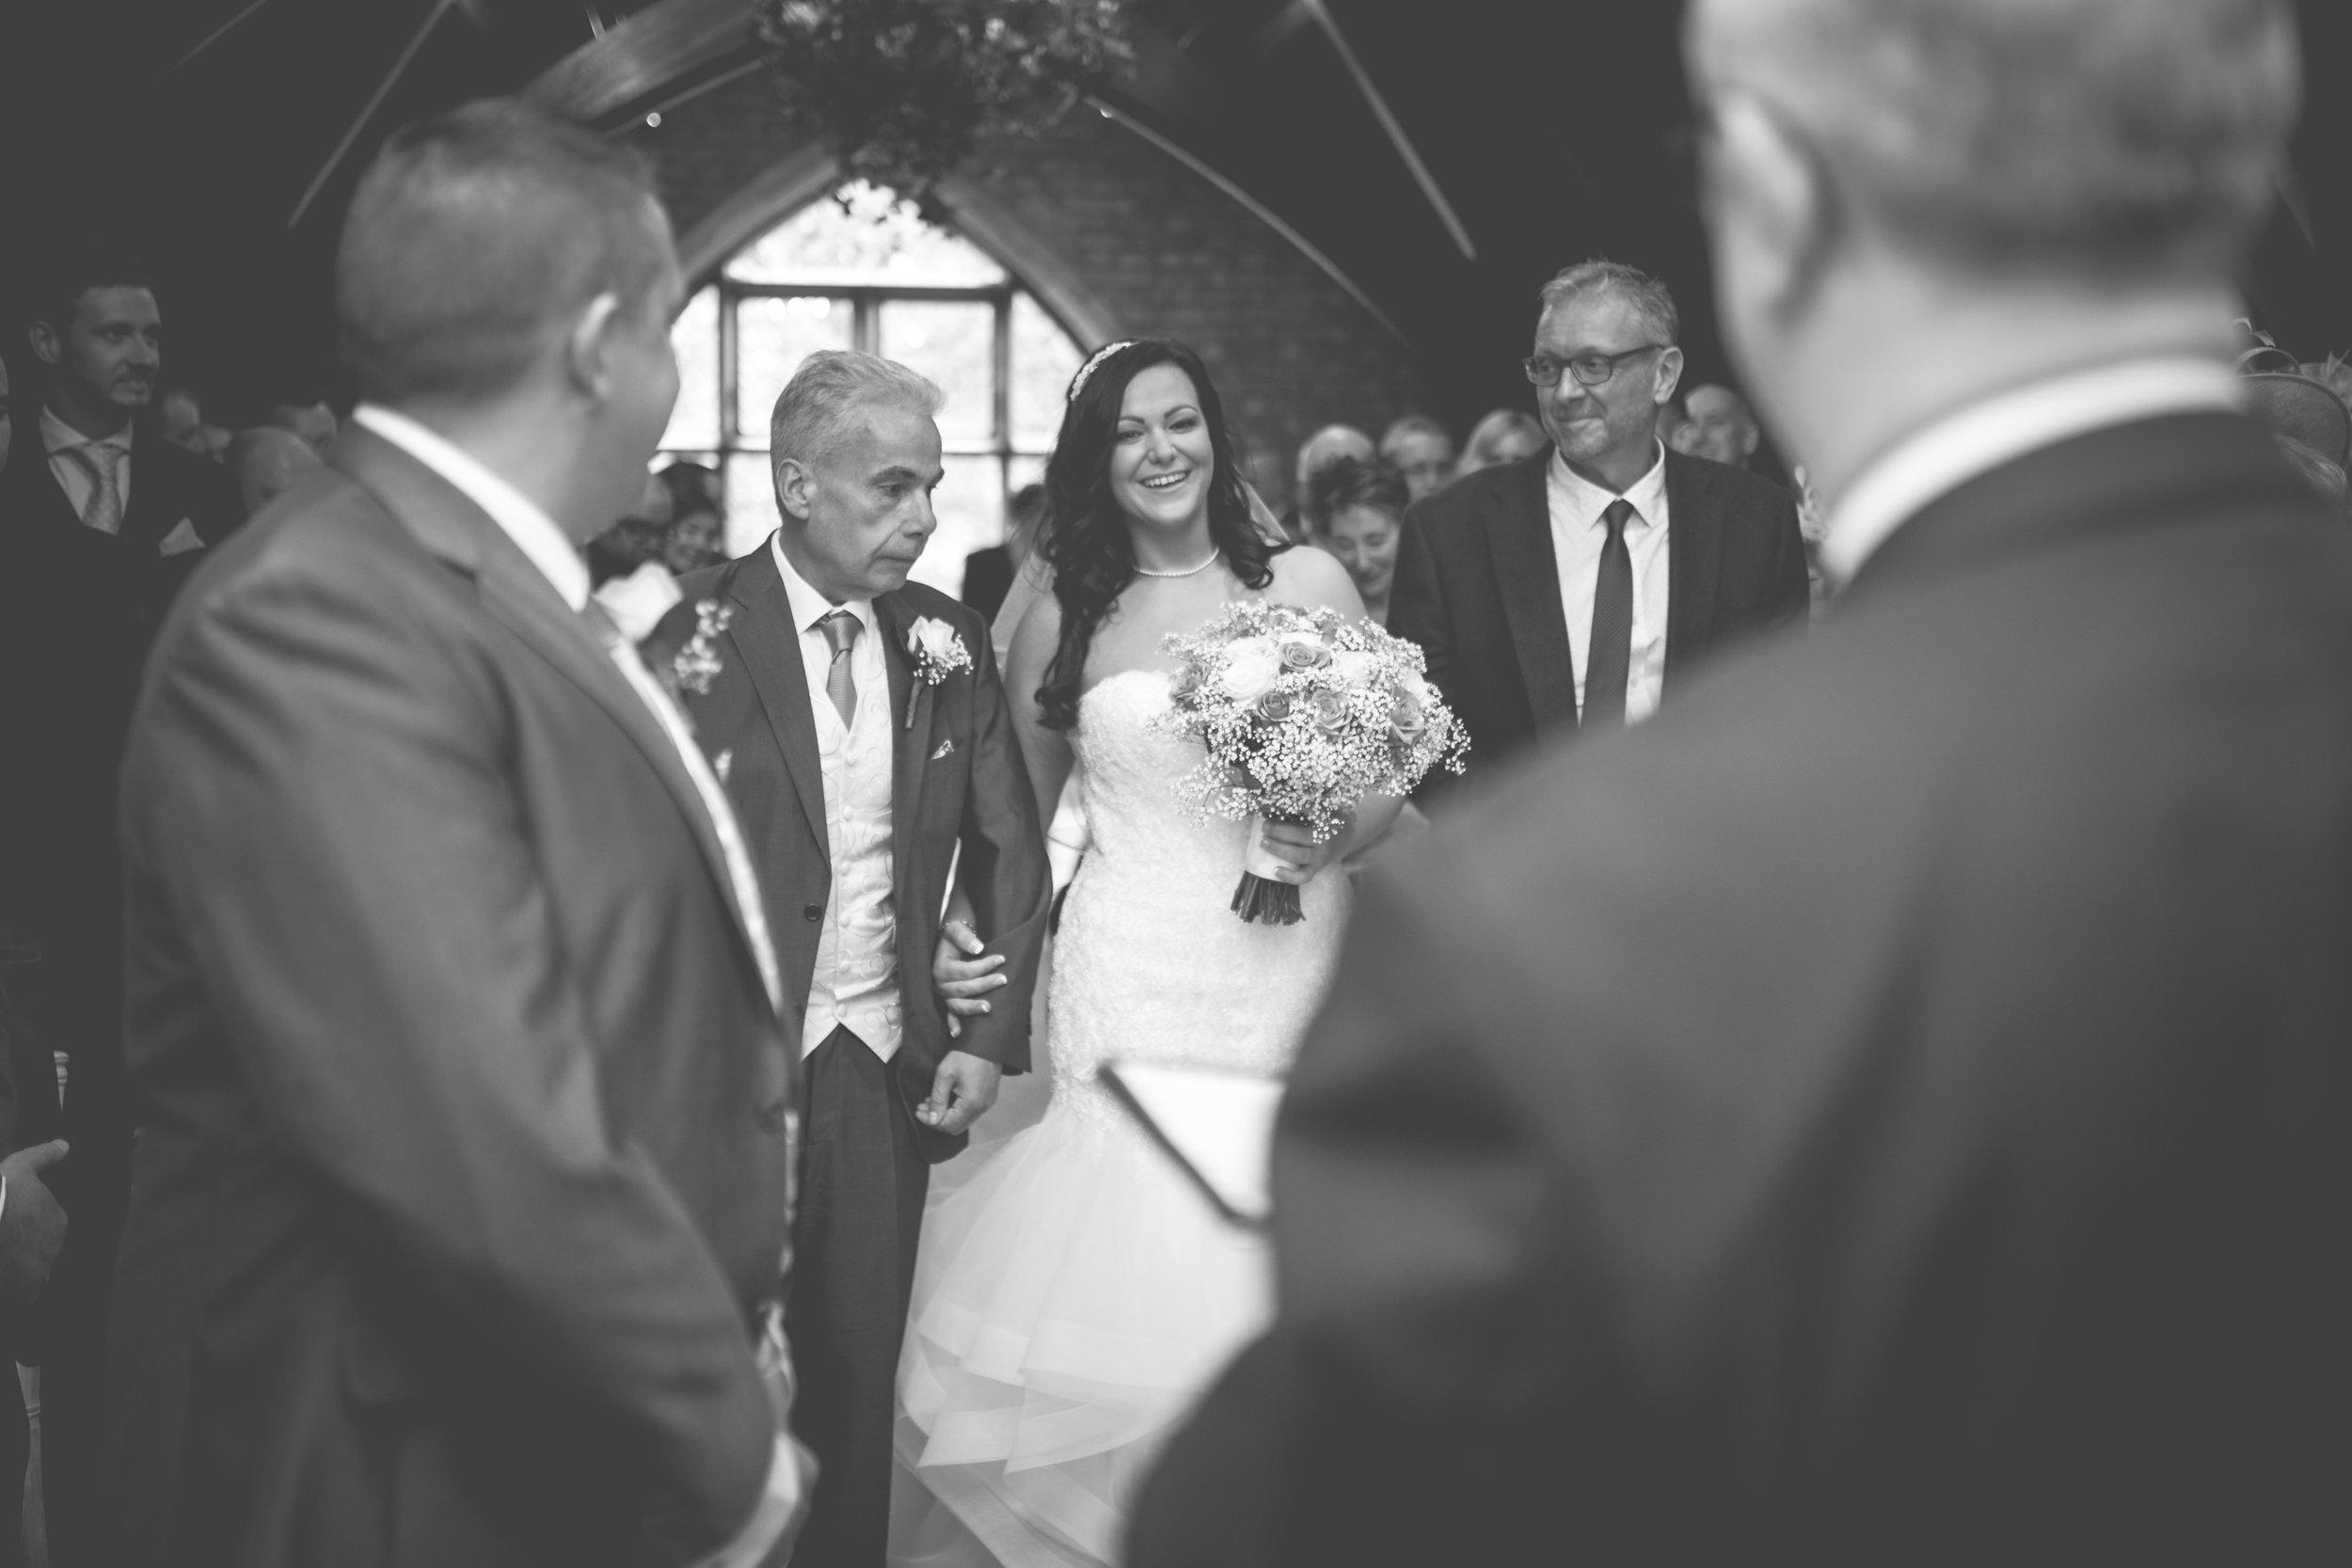 Helena & Terence - Ceremony-23.jpg